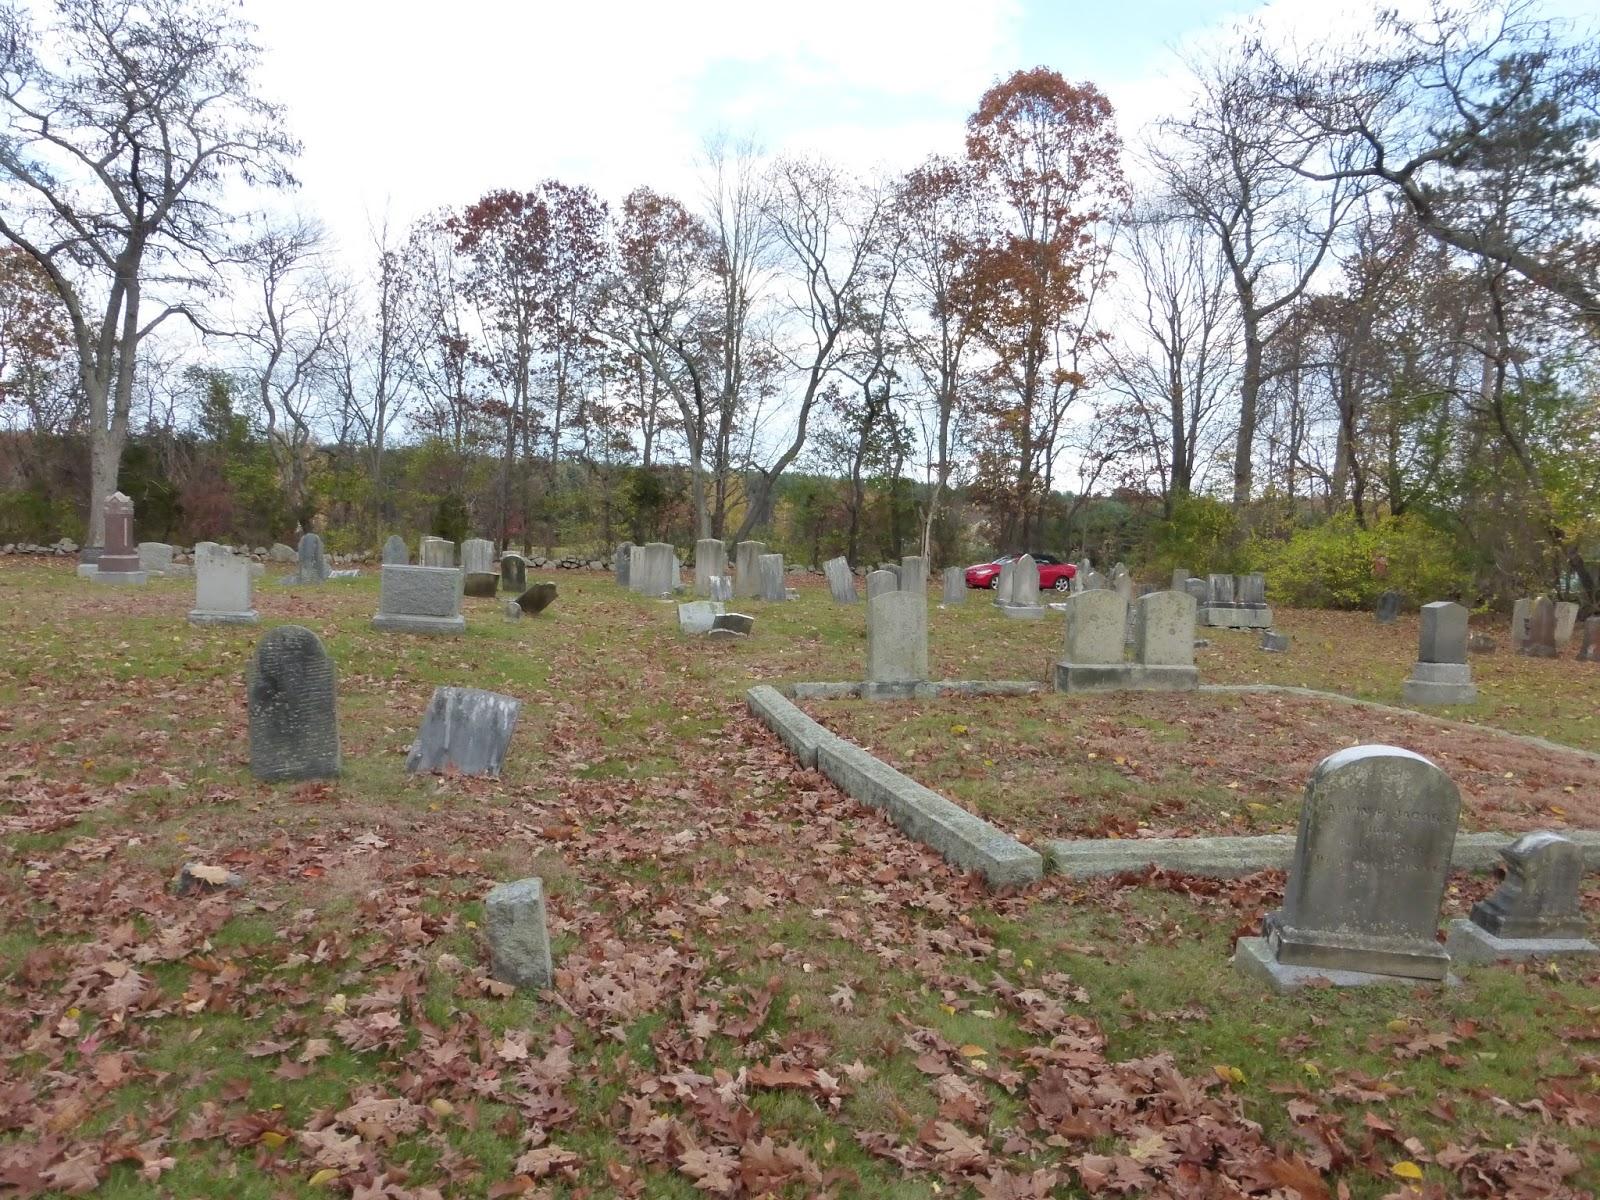 Nutfield Genealogy: Clues to finding Dodge's Row Burying Ground, Beverly, Massachusetts